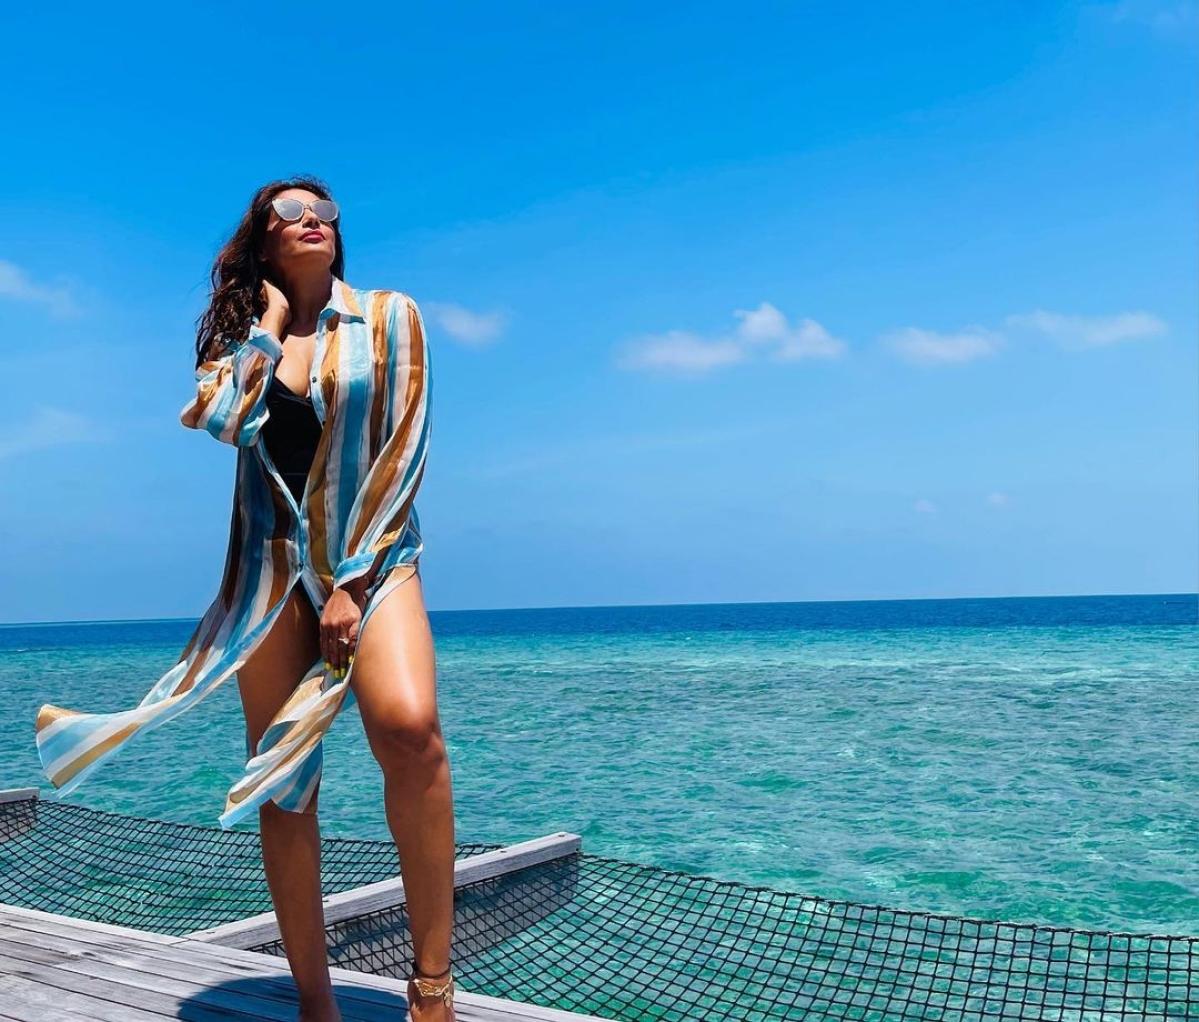 Bipasha Basu drops stunning bikini pics from her exotic vacay in Maldives